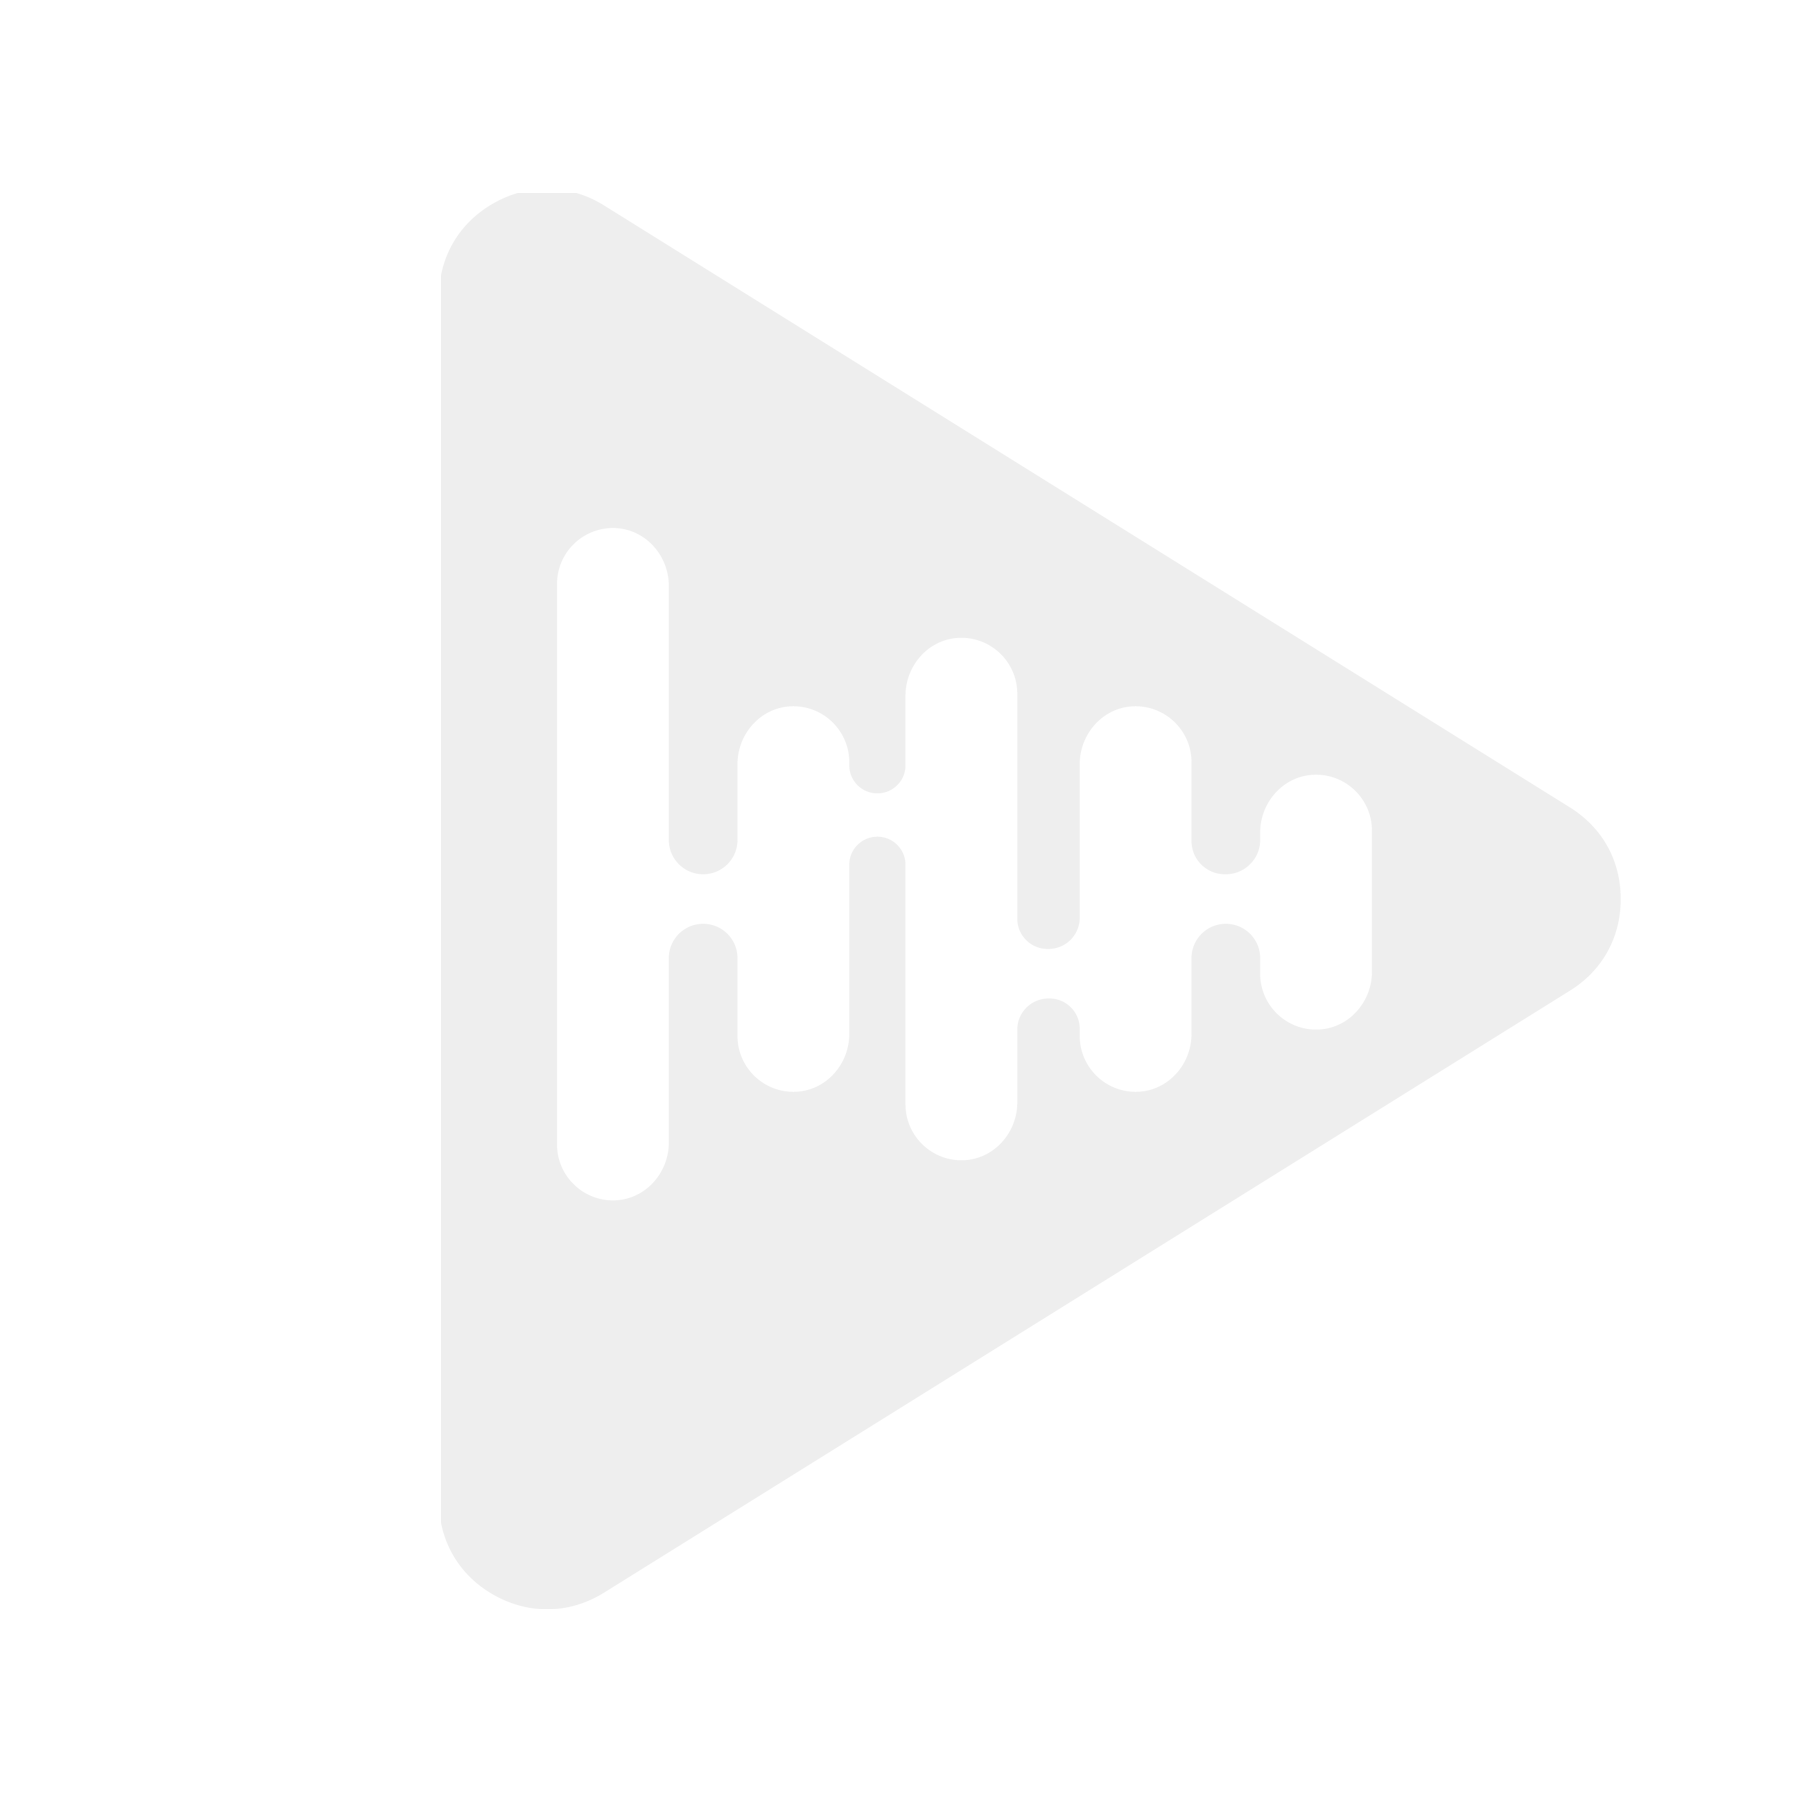 Morel VIRTUS NANO 602 CARBON